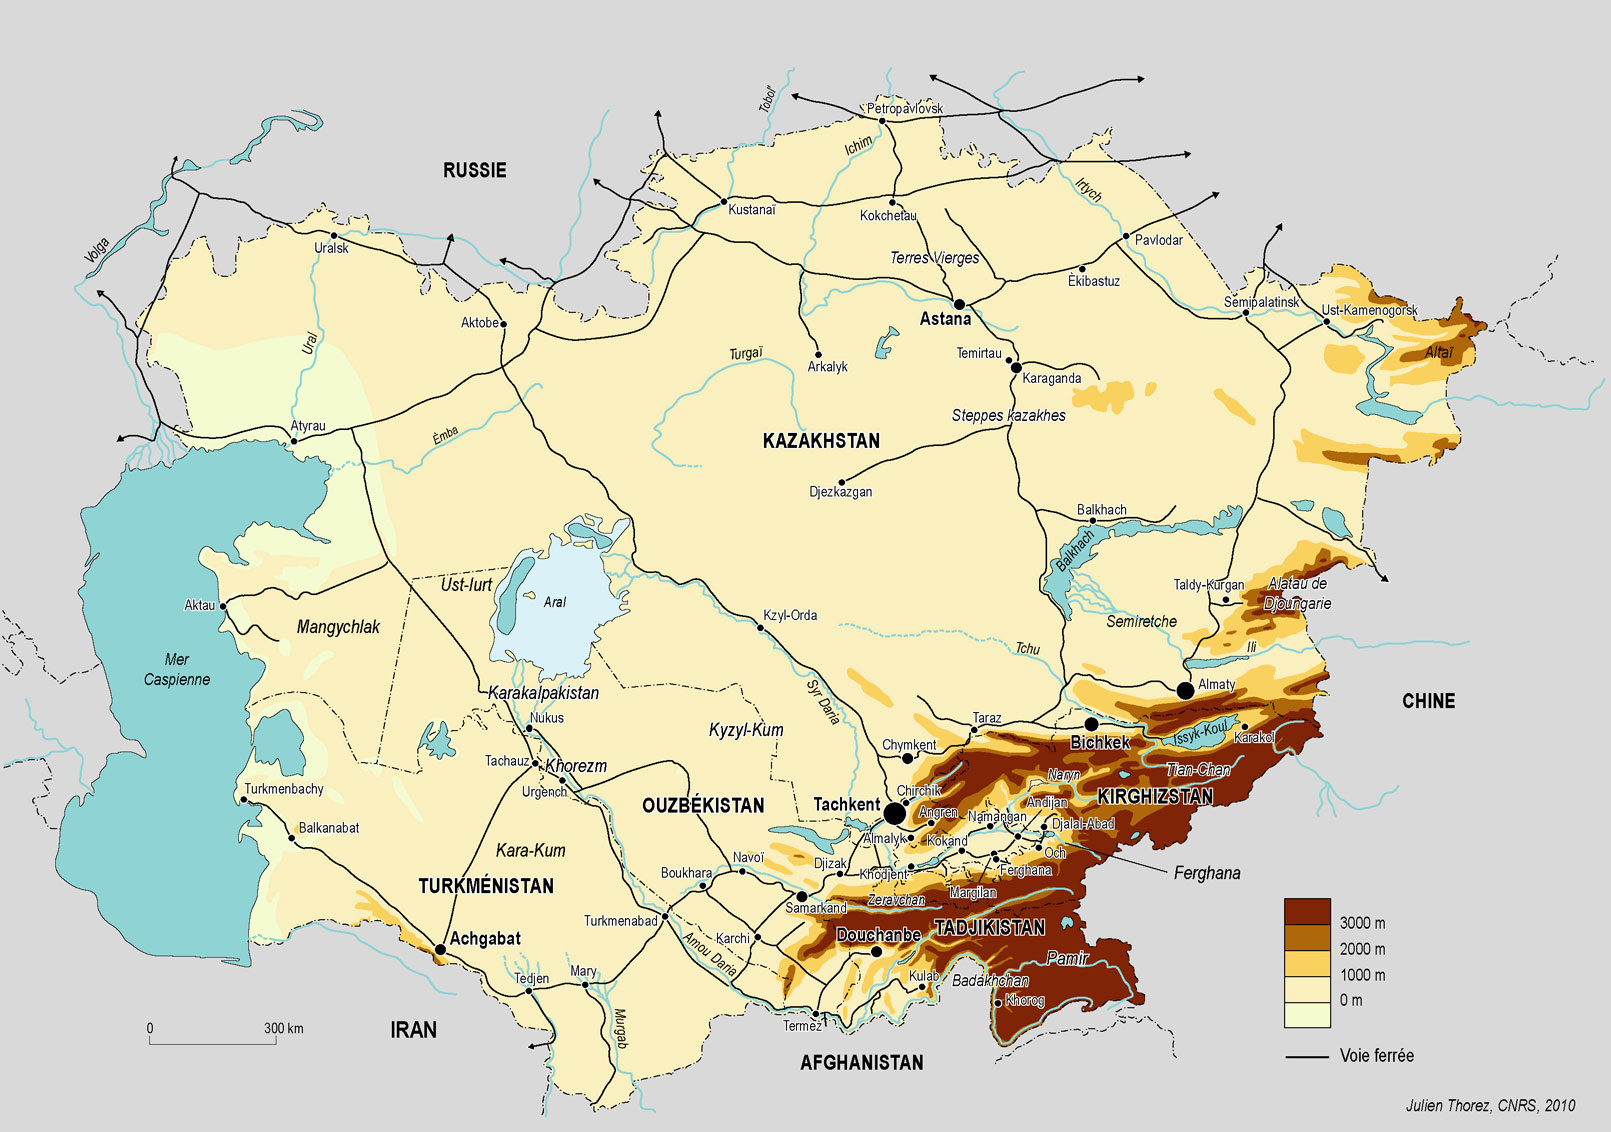 asie-centrale-carte-geographique